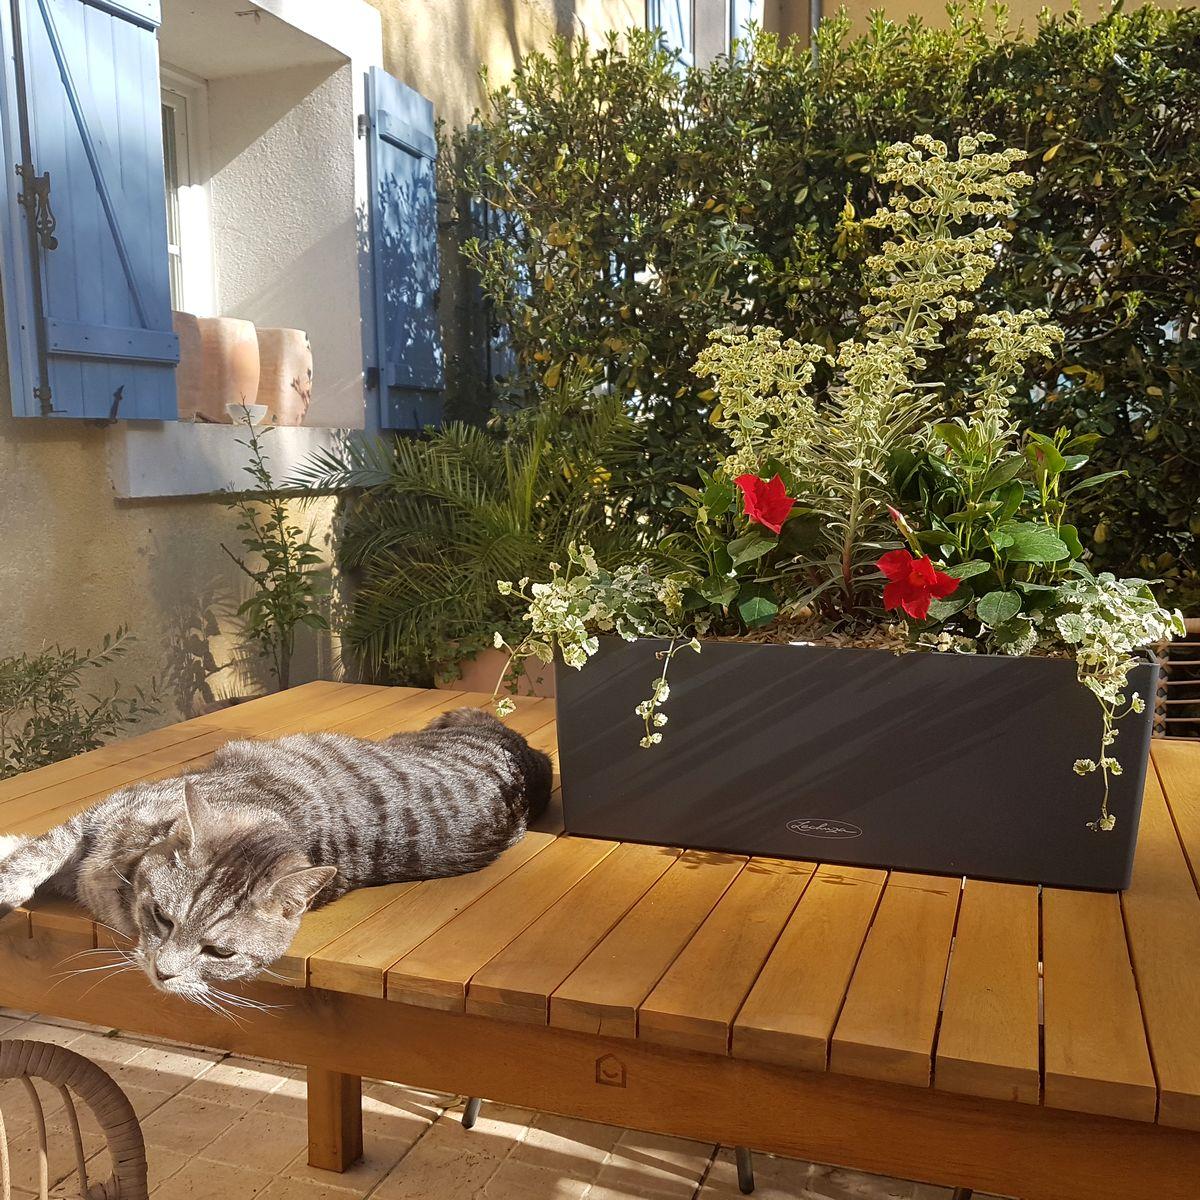 Jardinière plein soleil euphorbe dipladenia